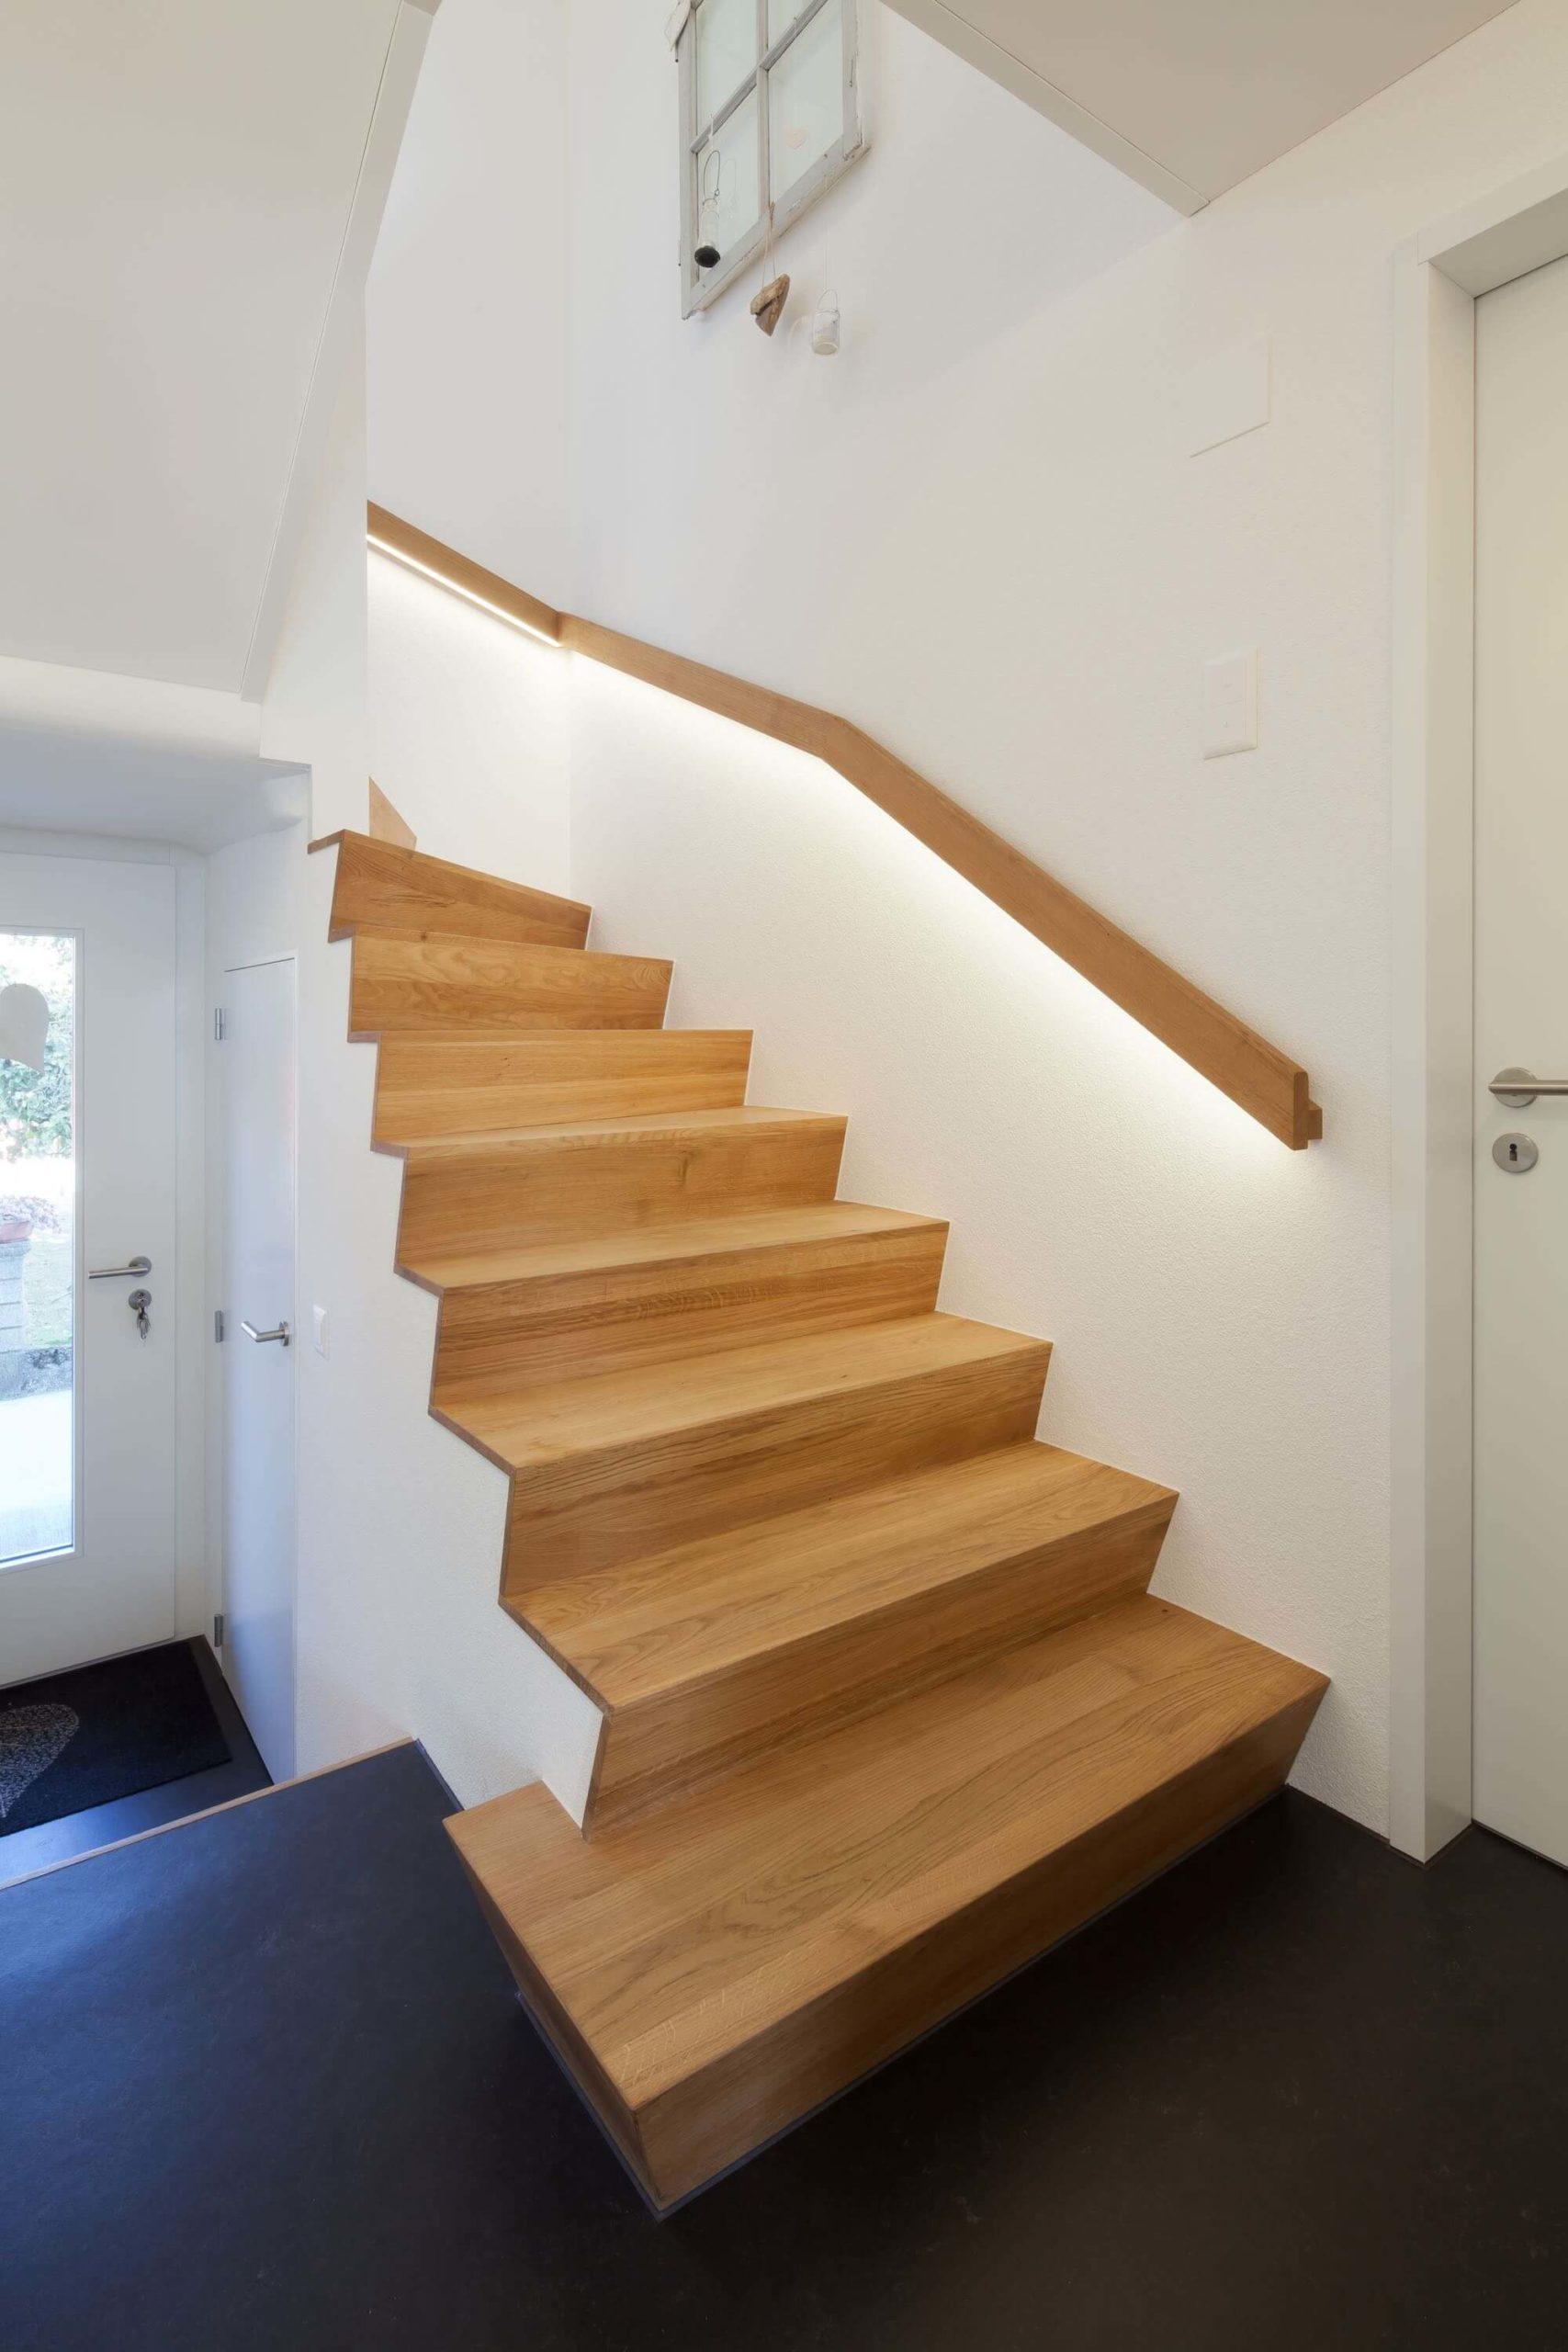 Gestaltung mit Trockenbau-Systemen durch die Viktor Wyss AG in Flumenthal, Solothurn